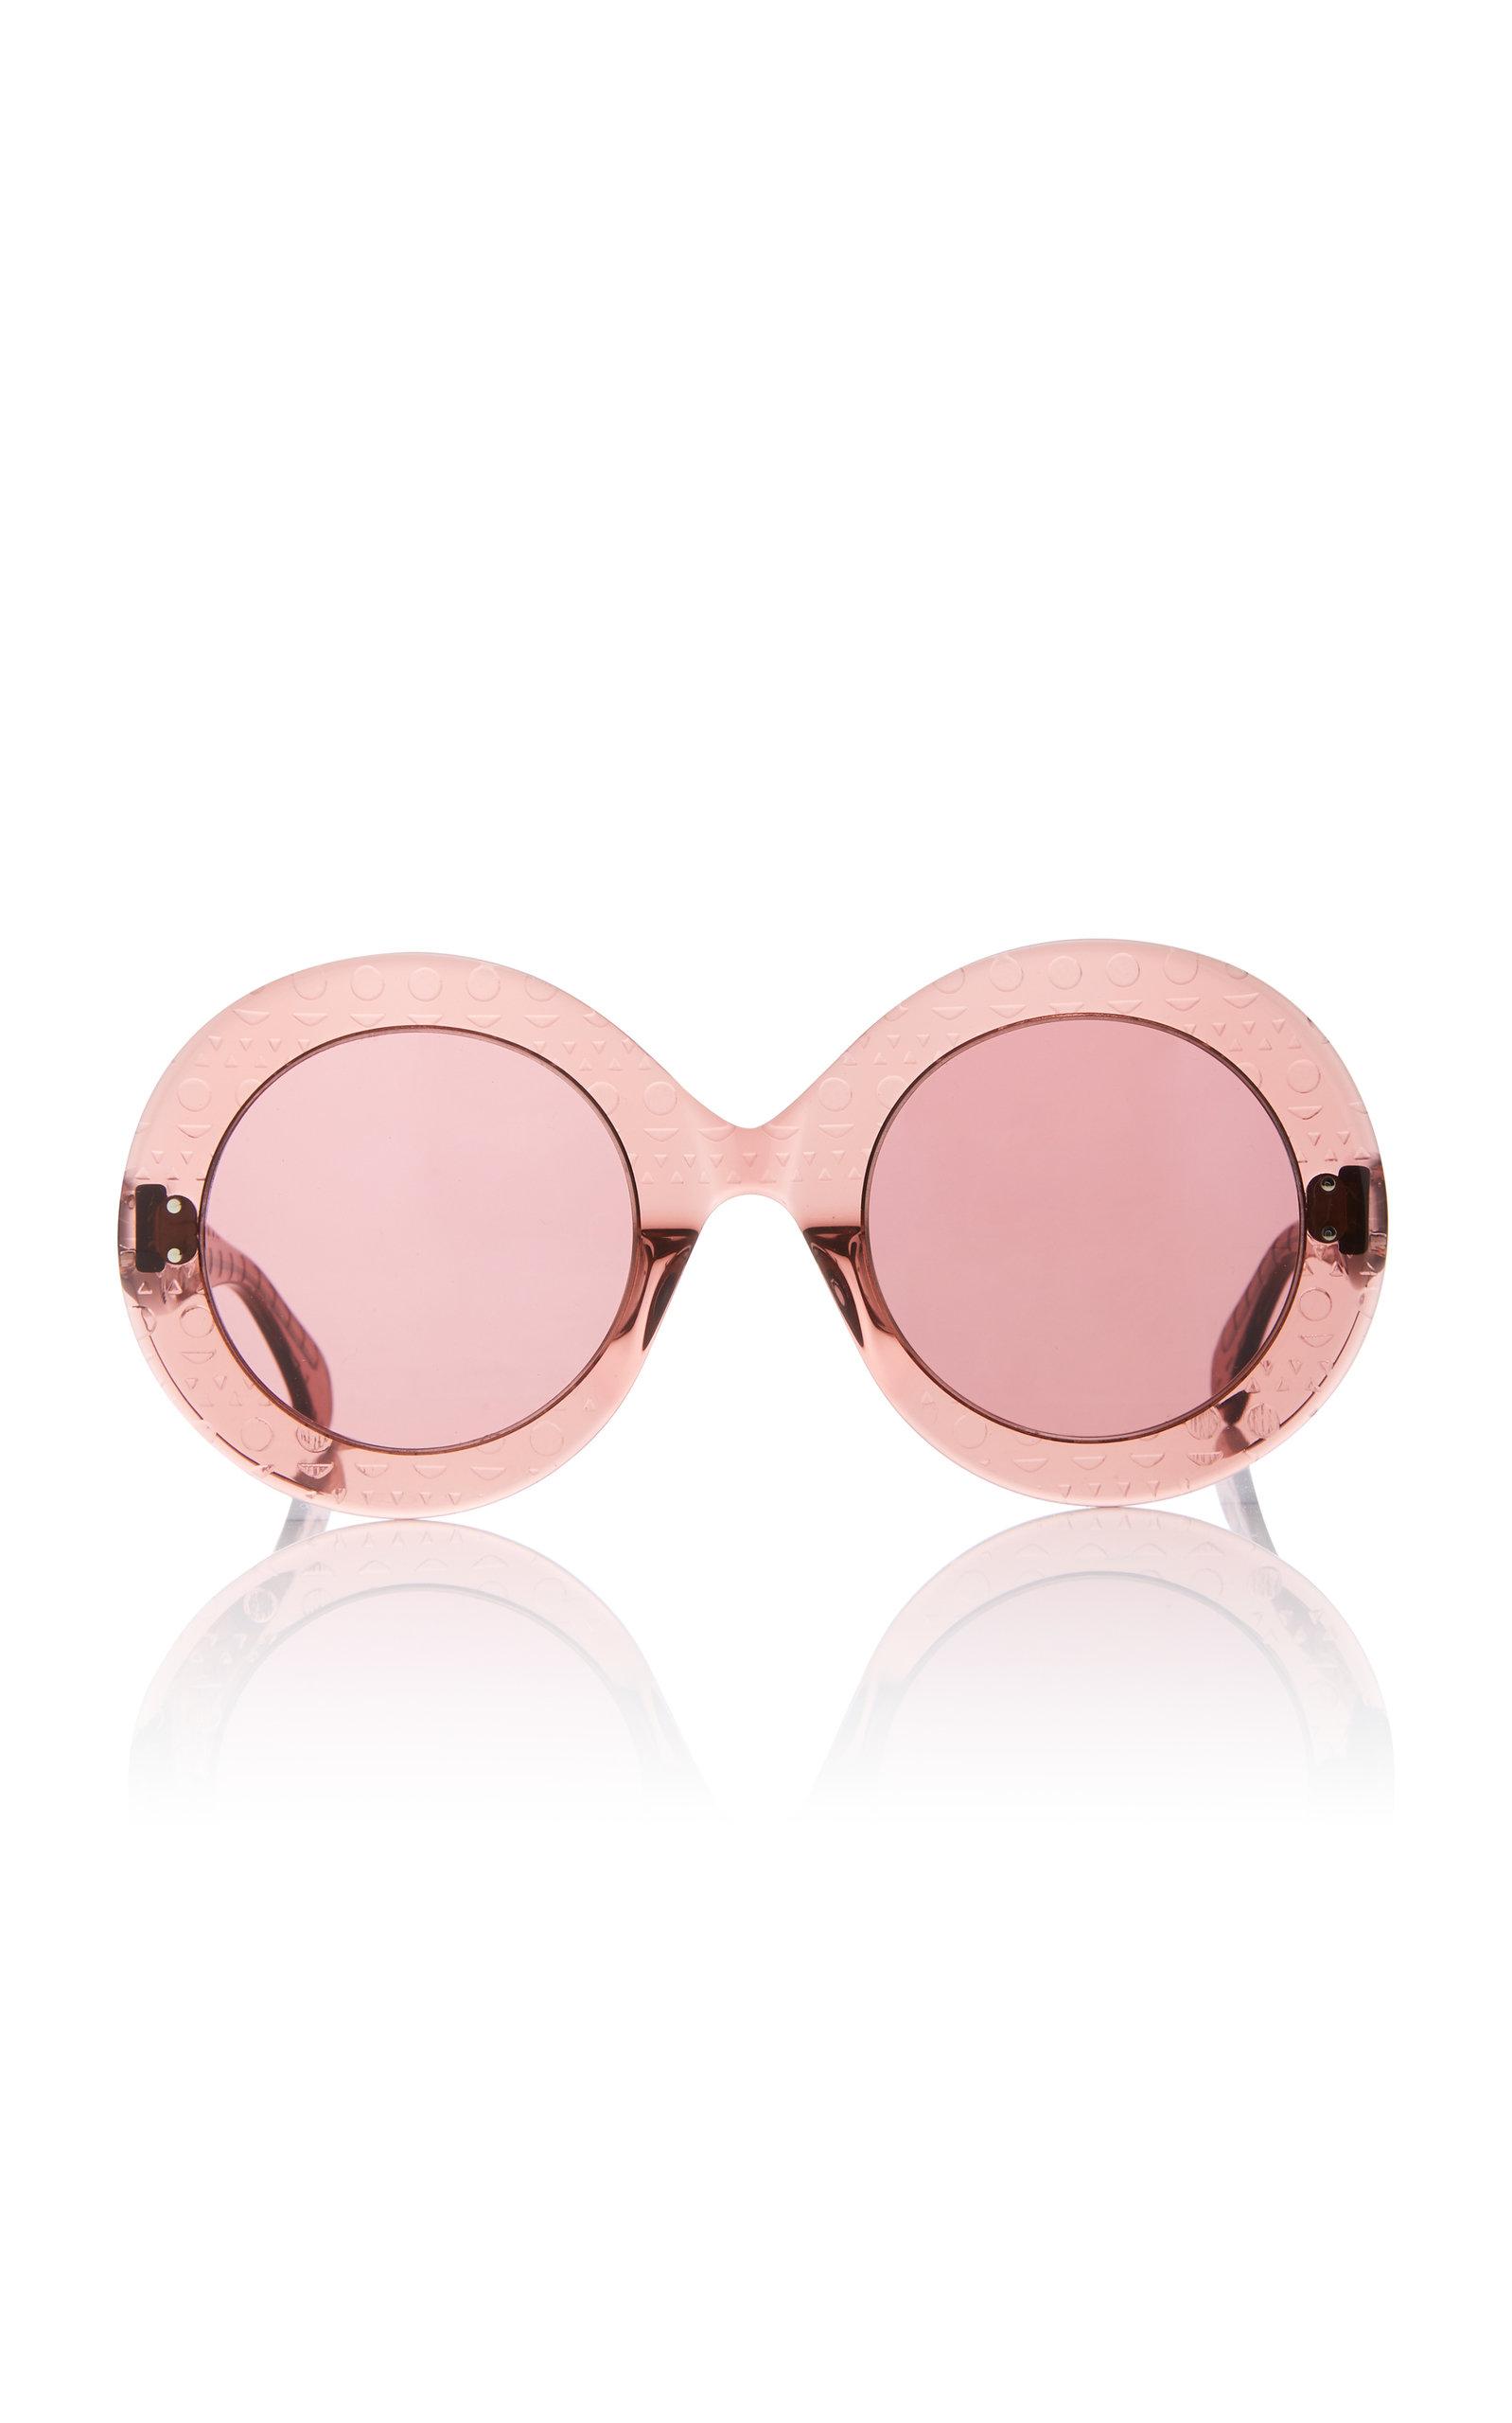 ALAIA SUNGLASSES Le Round Clou Sunglasses in Pink